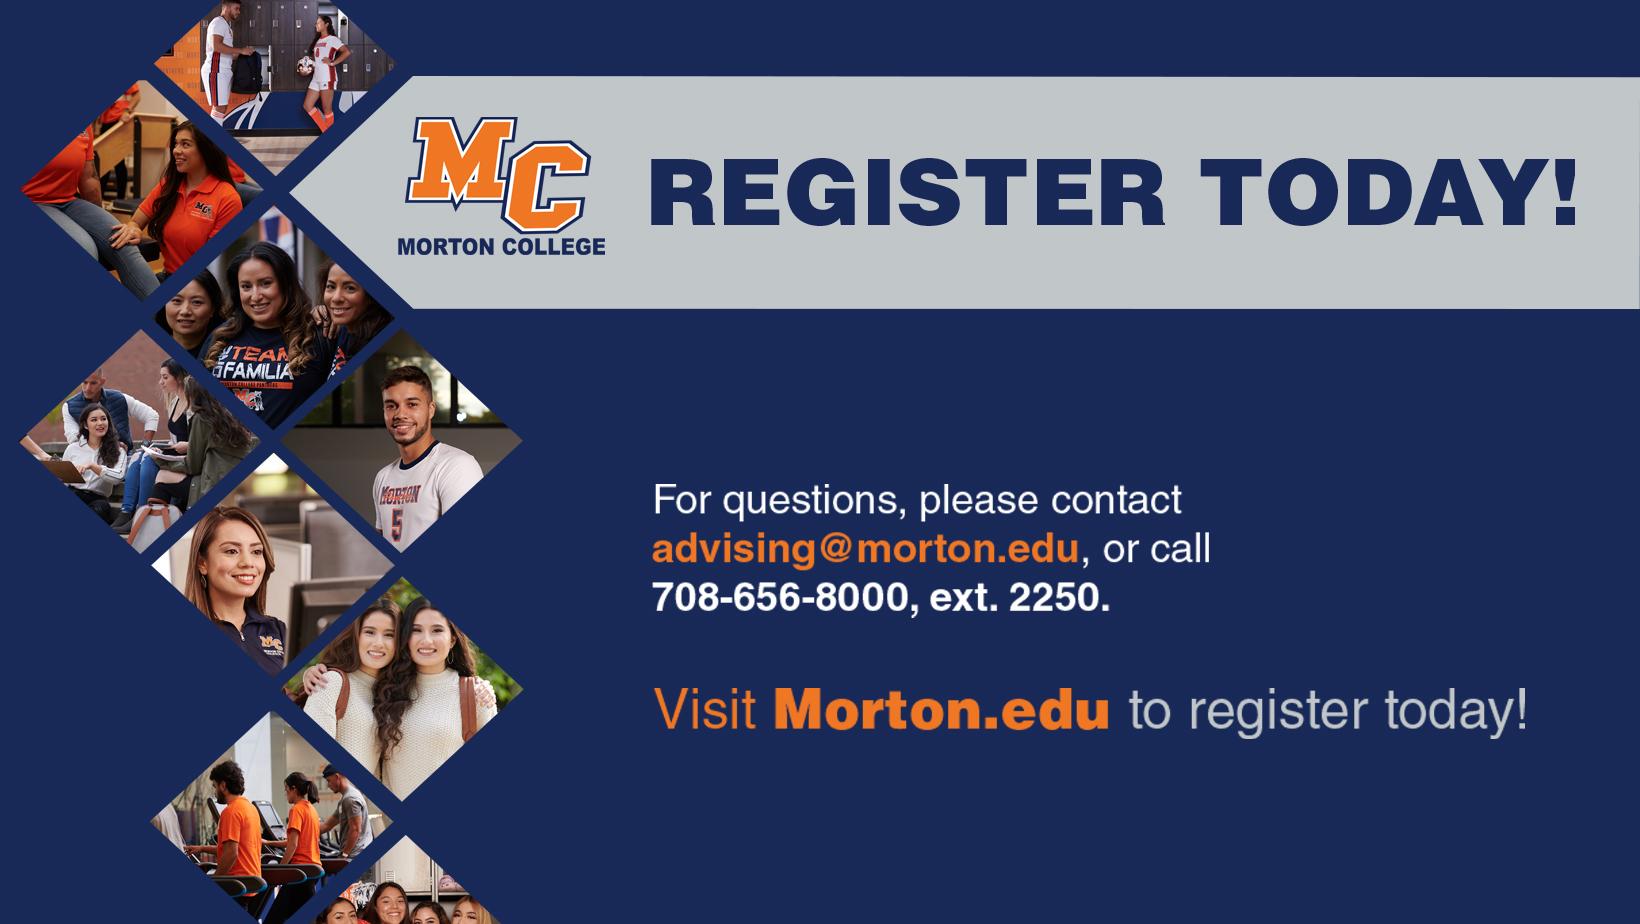 MC-RegistrationBanner2-21-1640-x-924_zoom